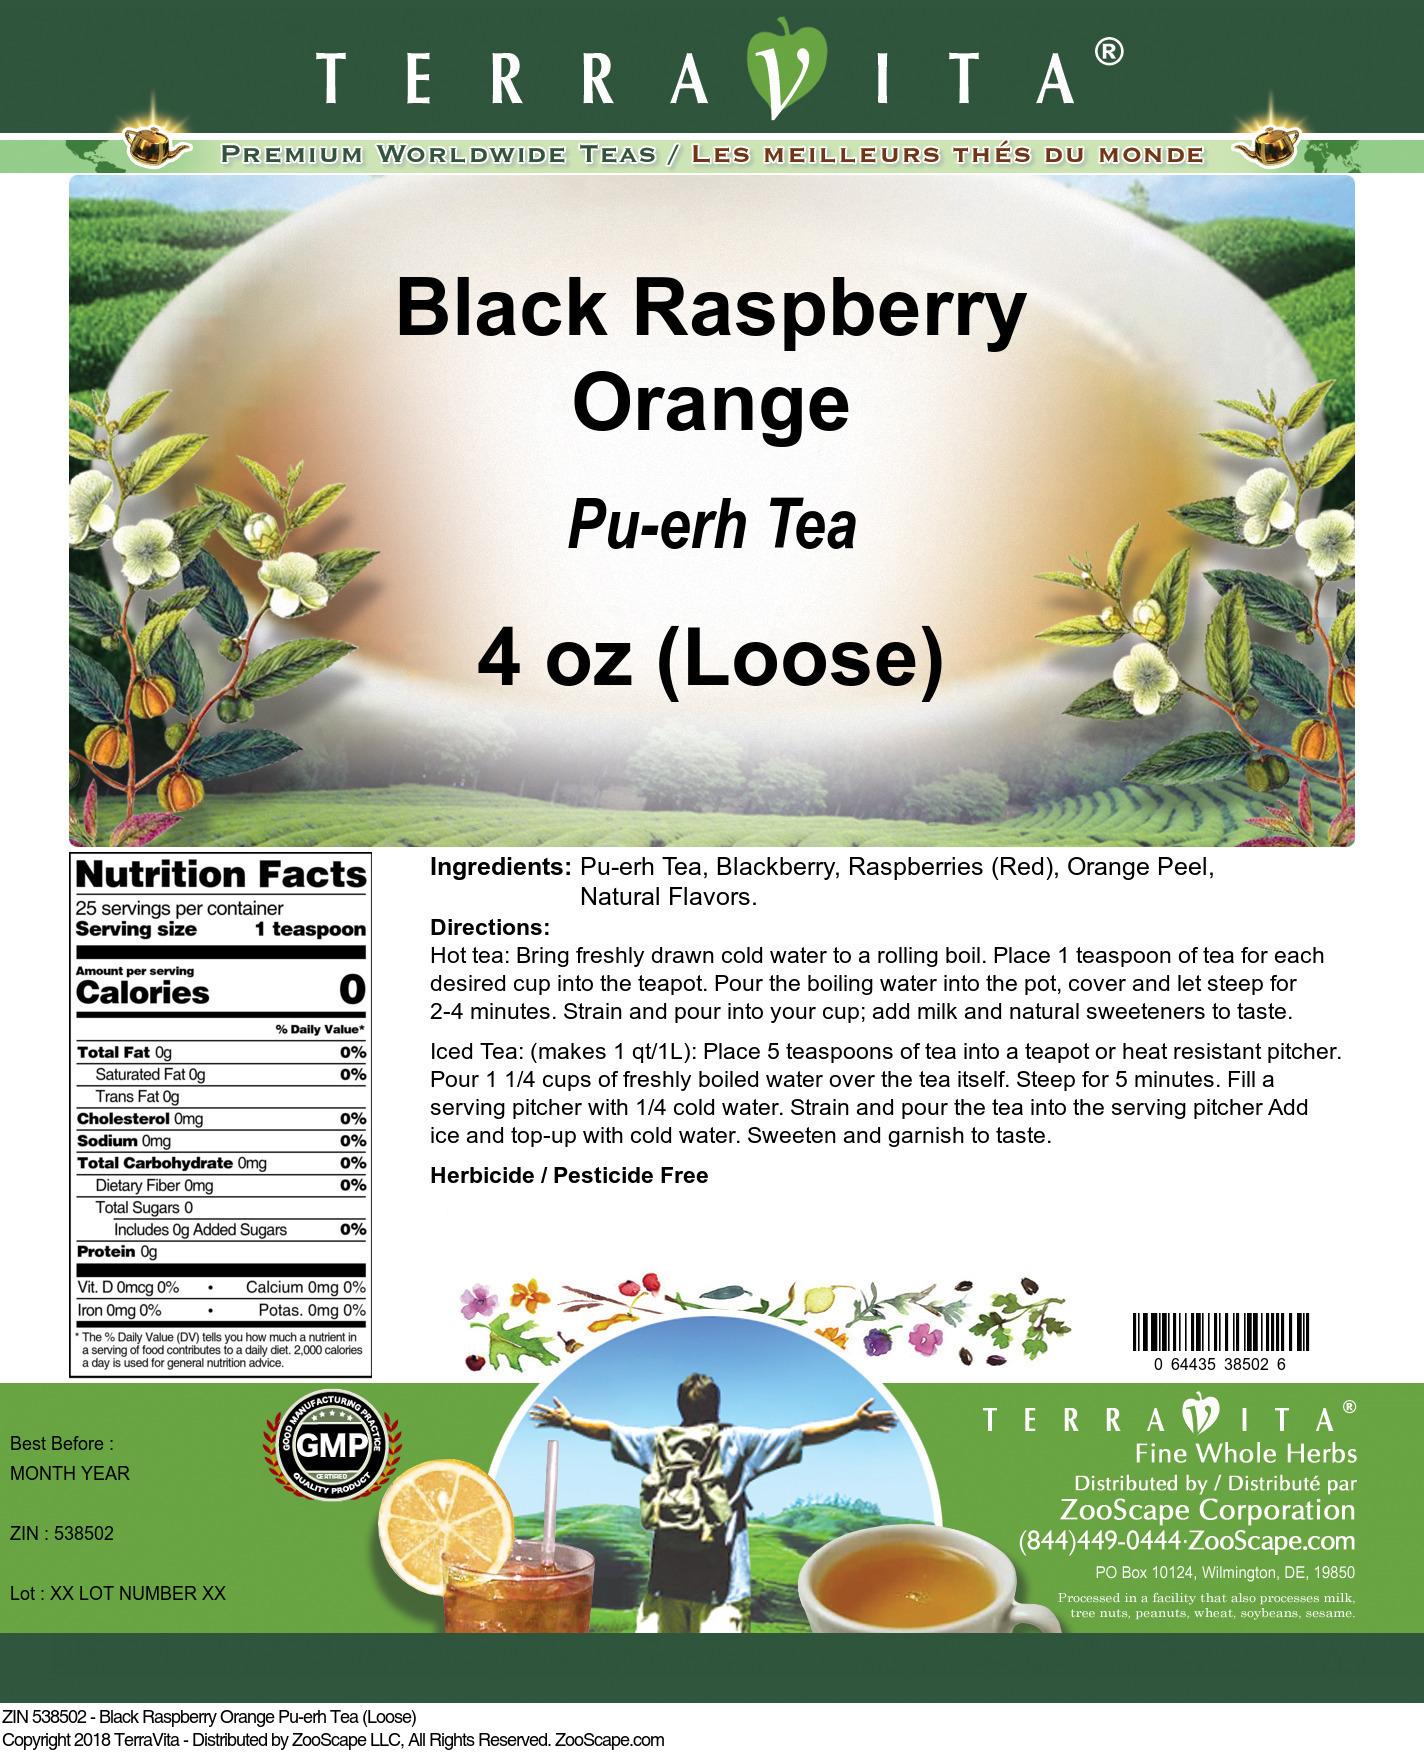 Black Raspberry Orange Pu-erh Tea (Loose)